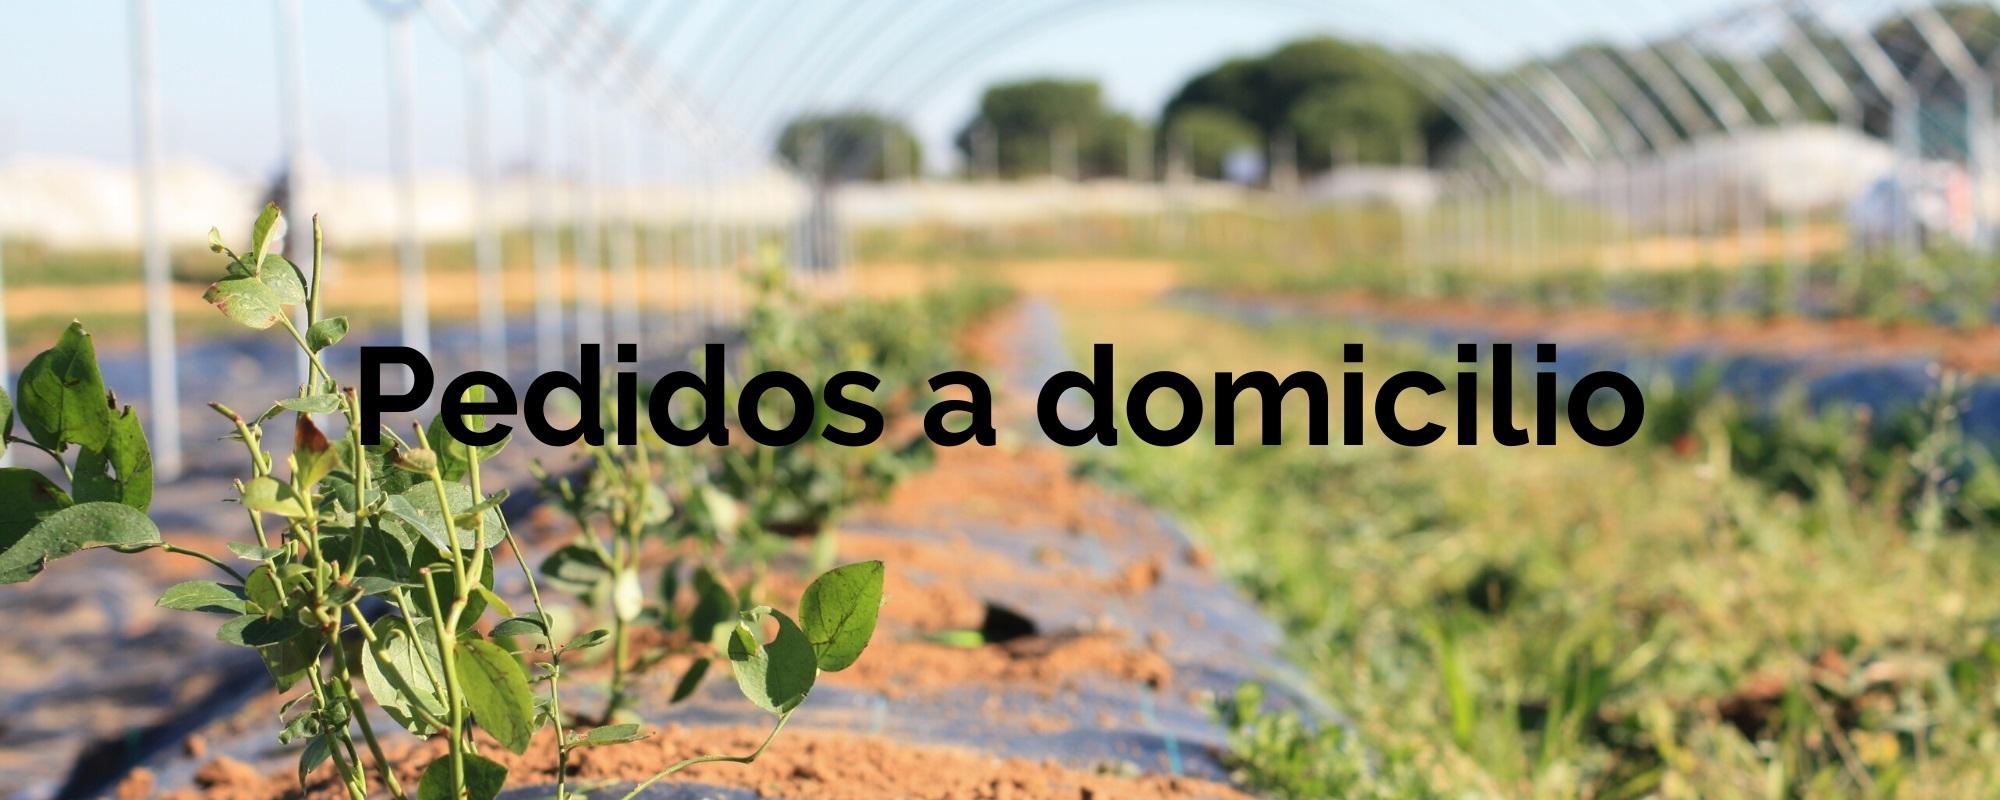 pedidos-a-domicilio-agroecologica-el-origen-agricultura-ecologica-01